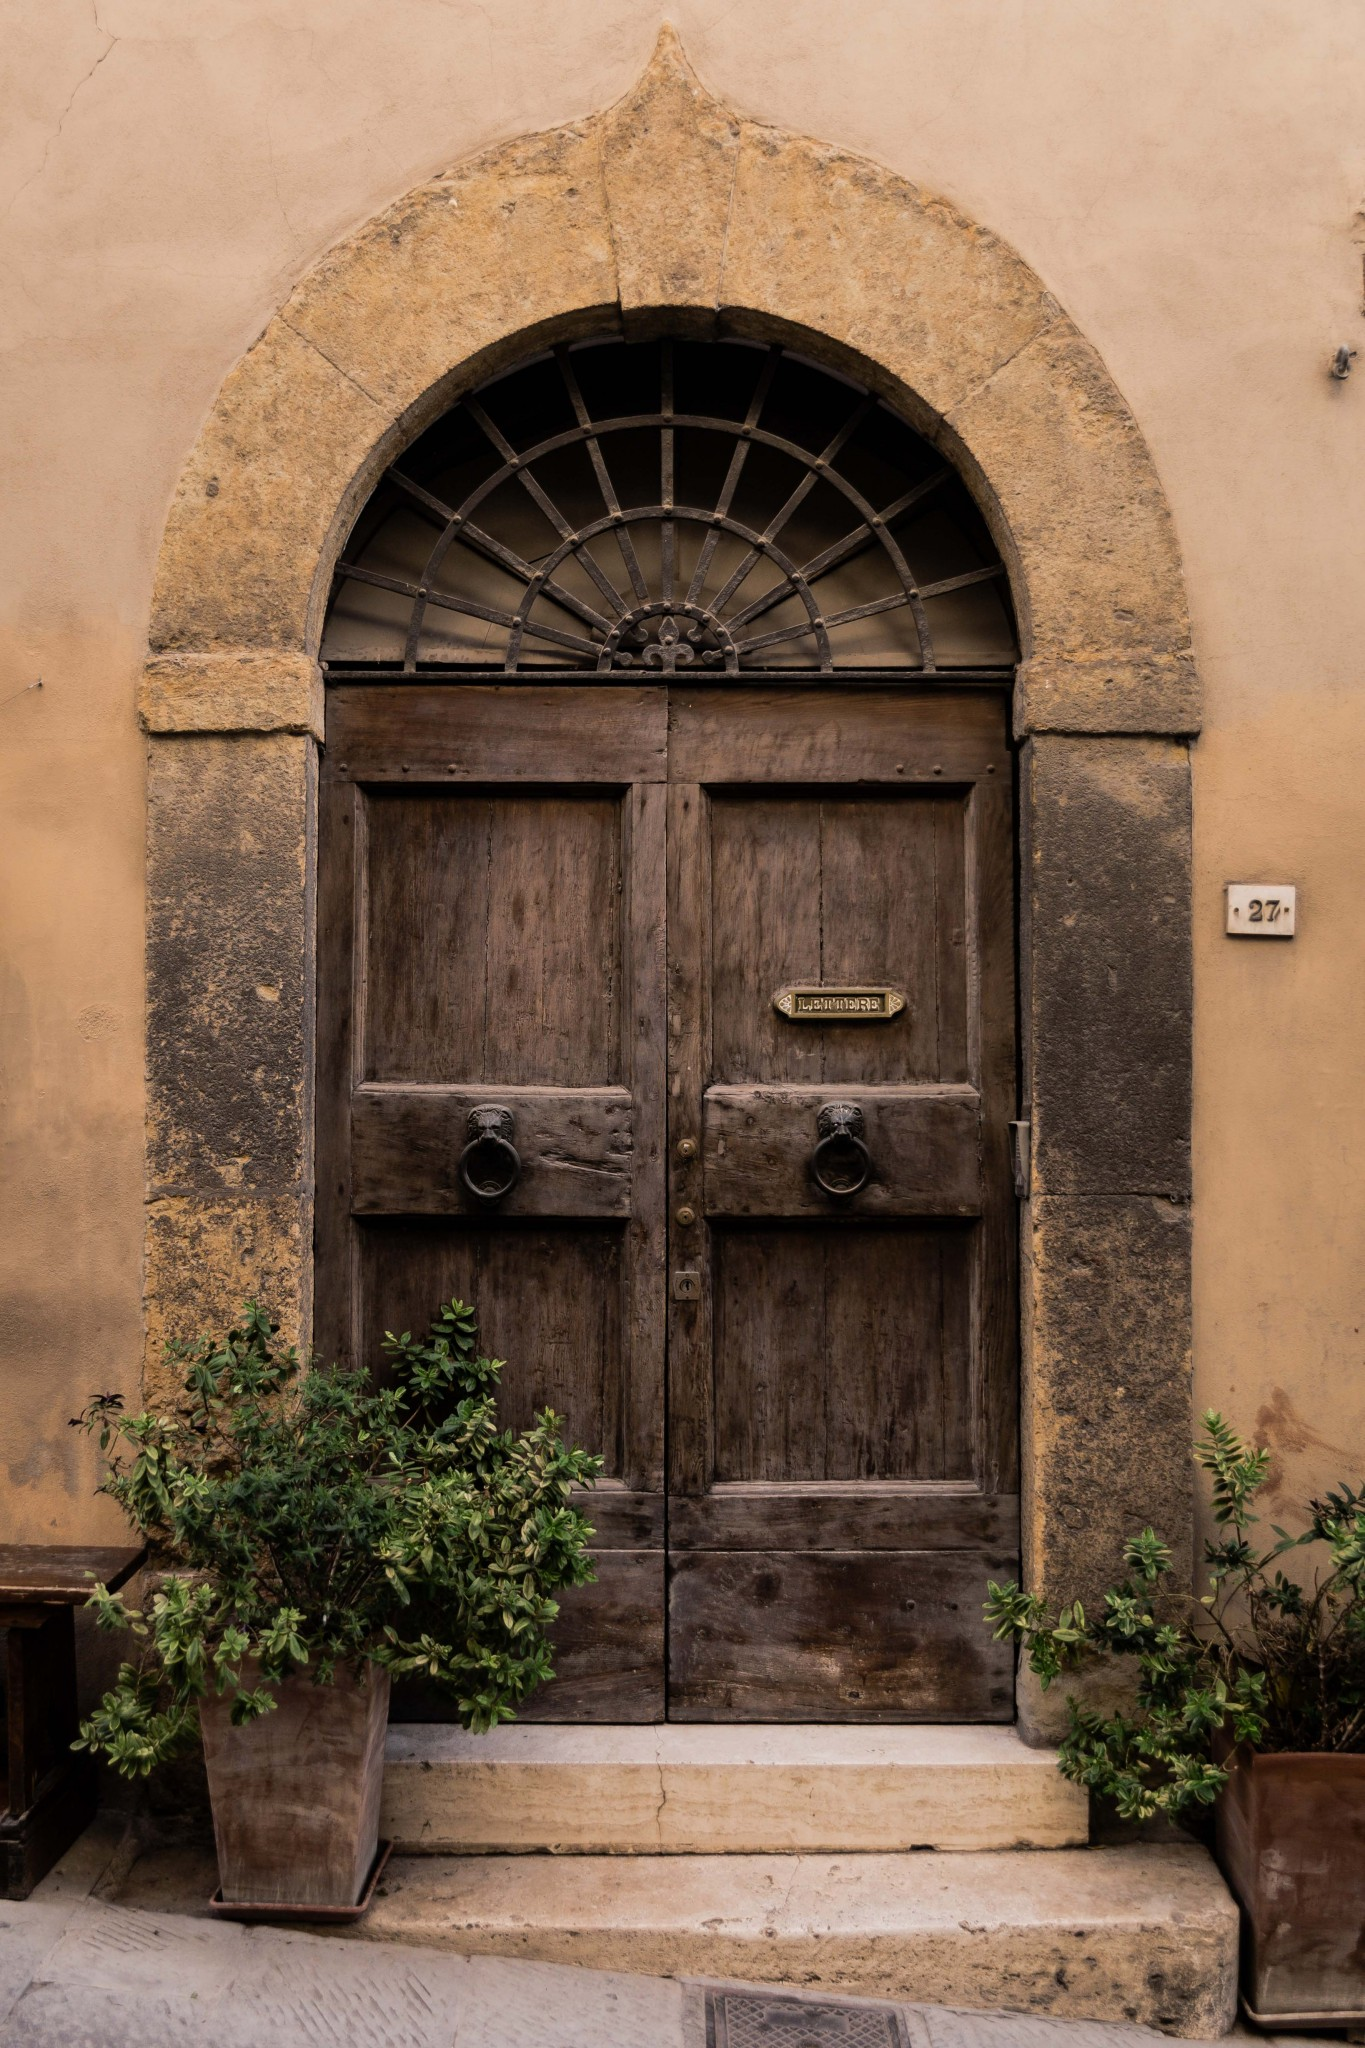 tuscany2 (26 of 39)